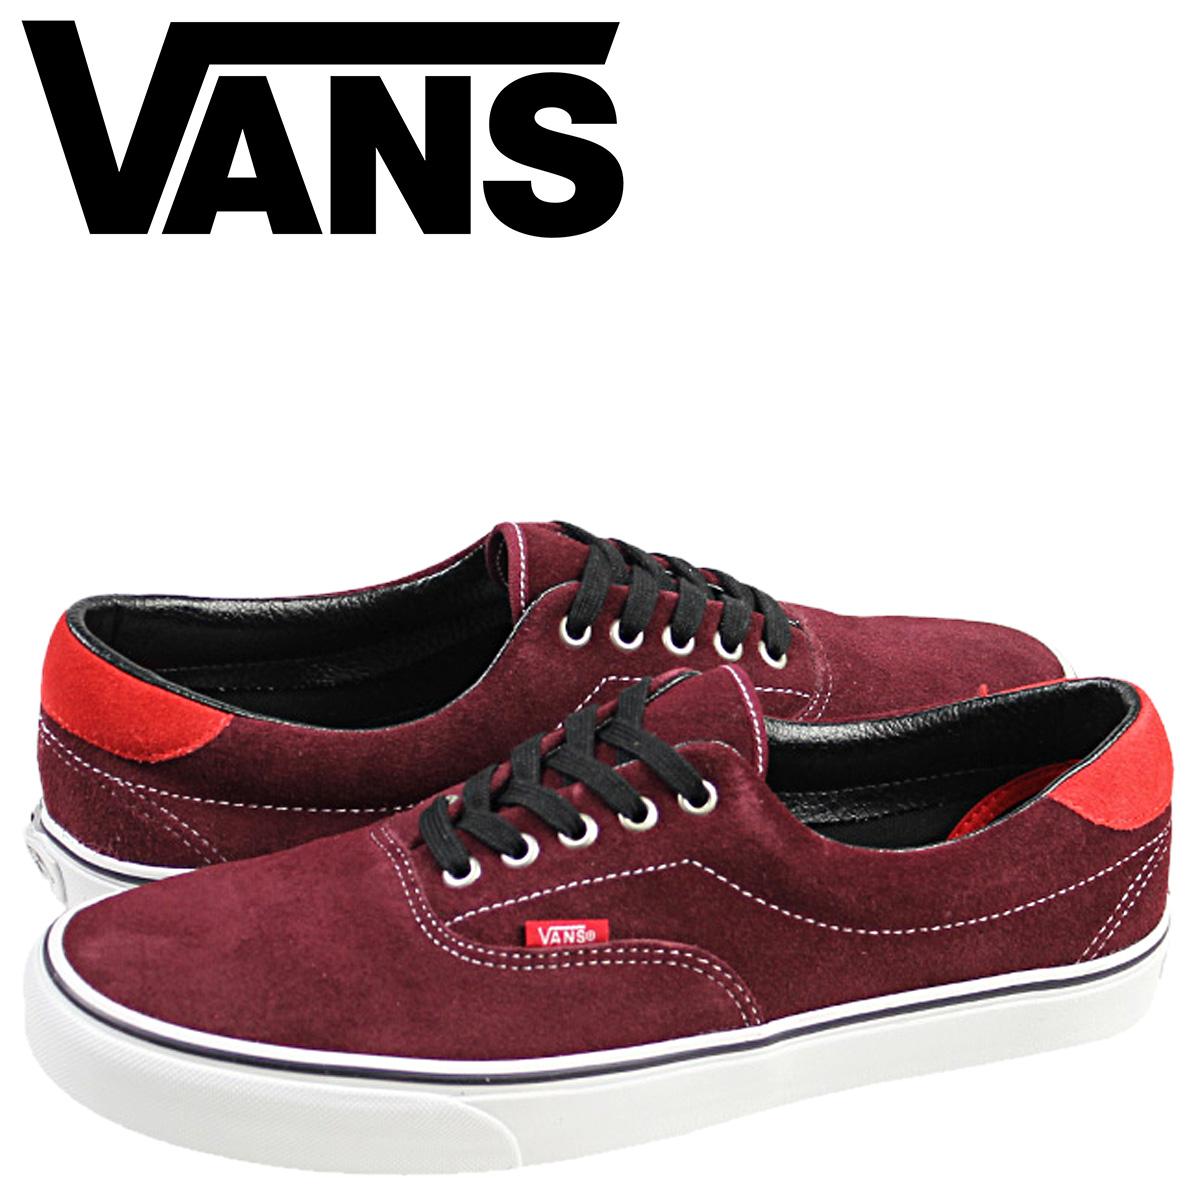 Sugar Online Shop  Vans VANS ERA 59 EARTHTONE SUEDE sneaker era fifty nine  Aston suede men s VN-0UC6DHZ Port Royal  regular   71a5da1e901e